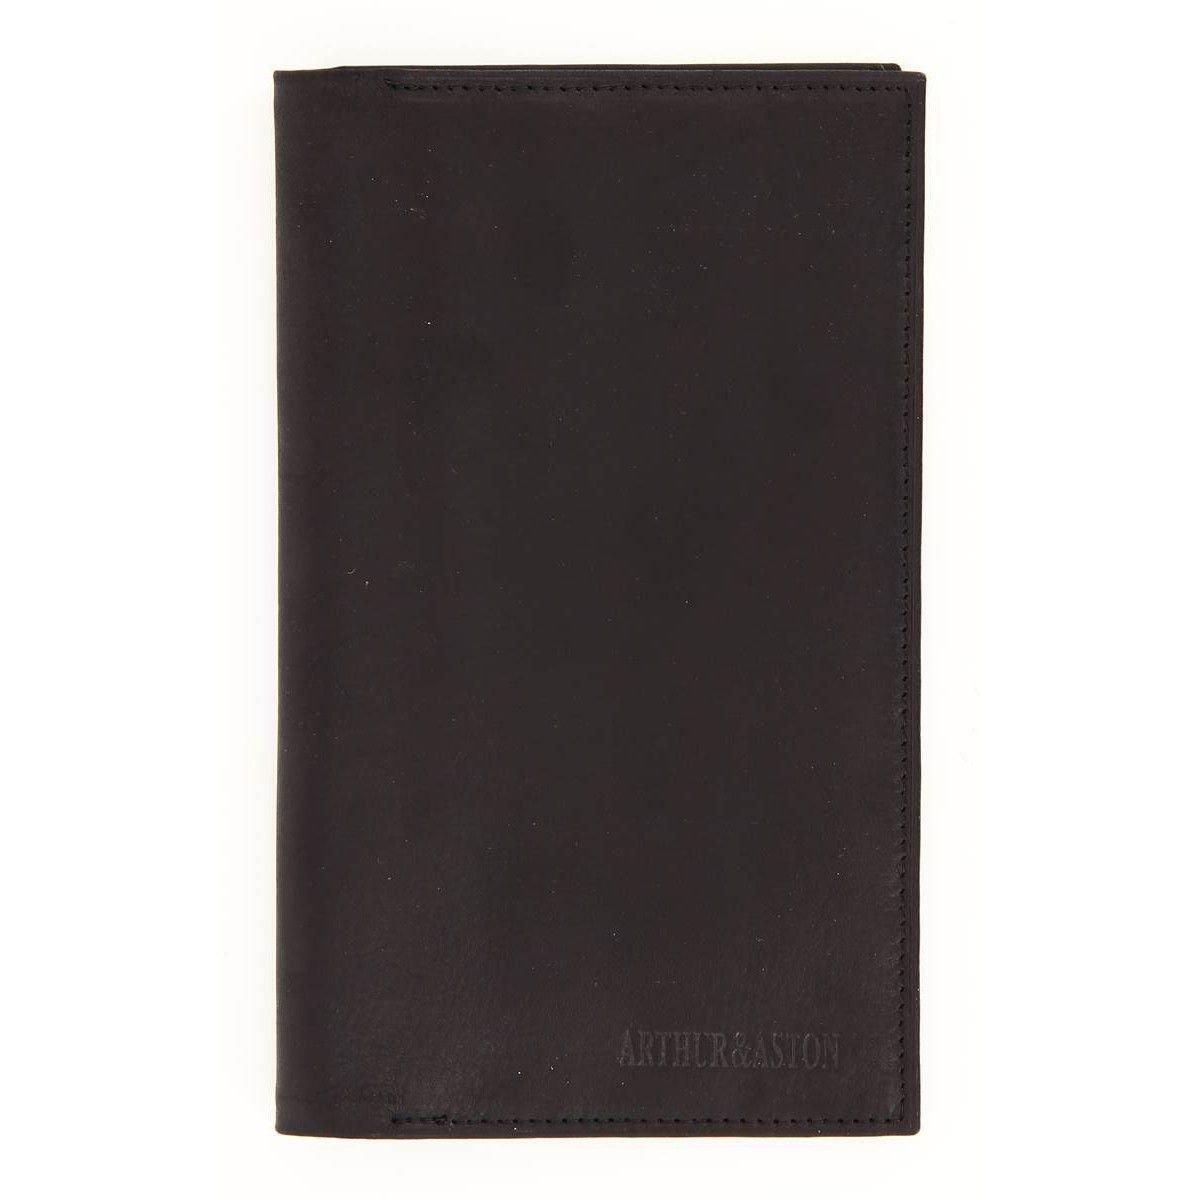 Arthur & Aston - Porte chéquier homme en cuir (94-206) arthur et aston